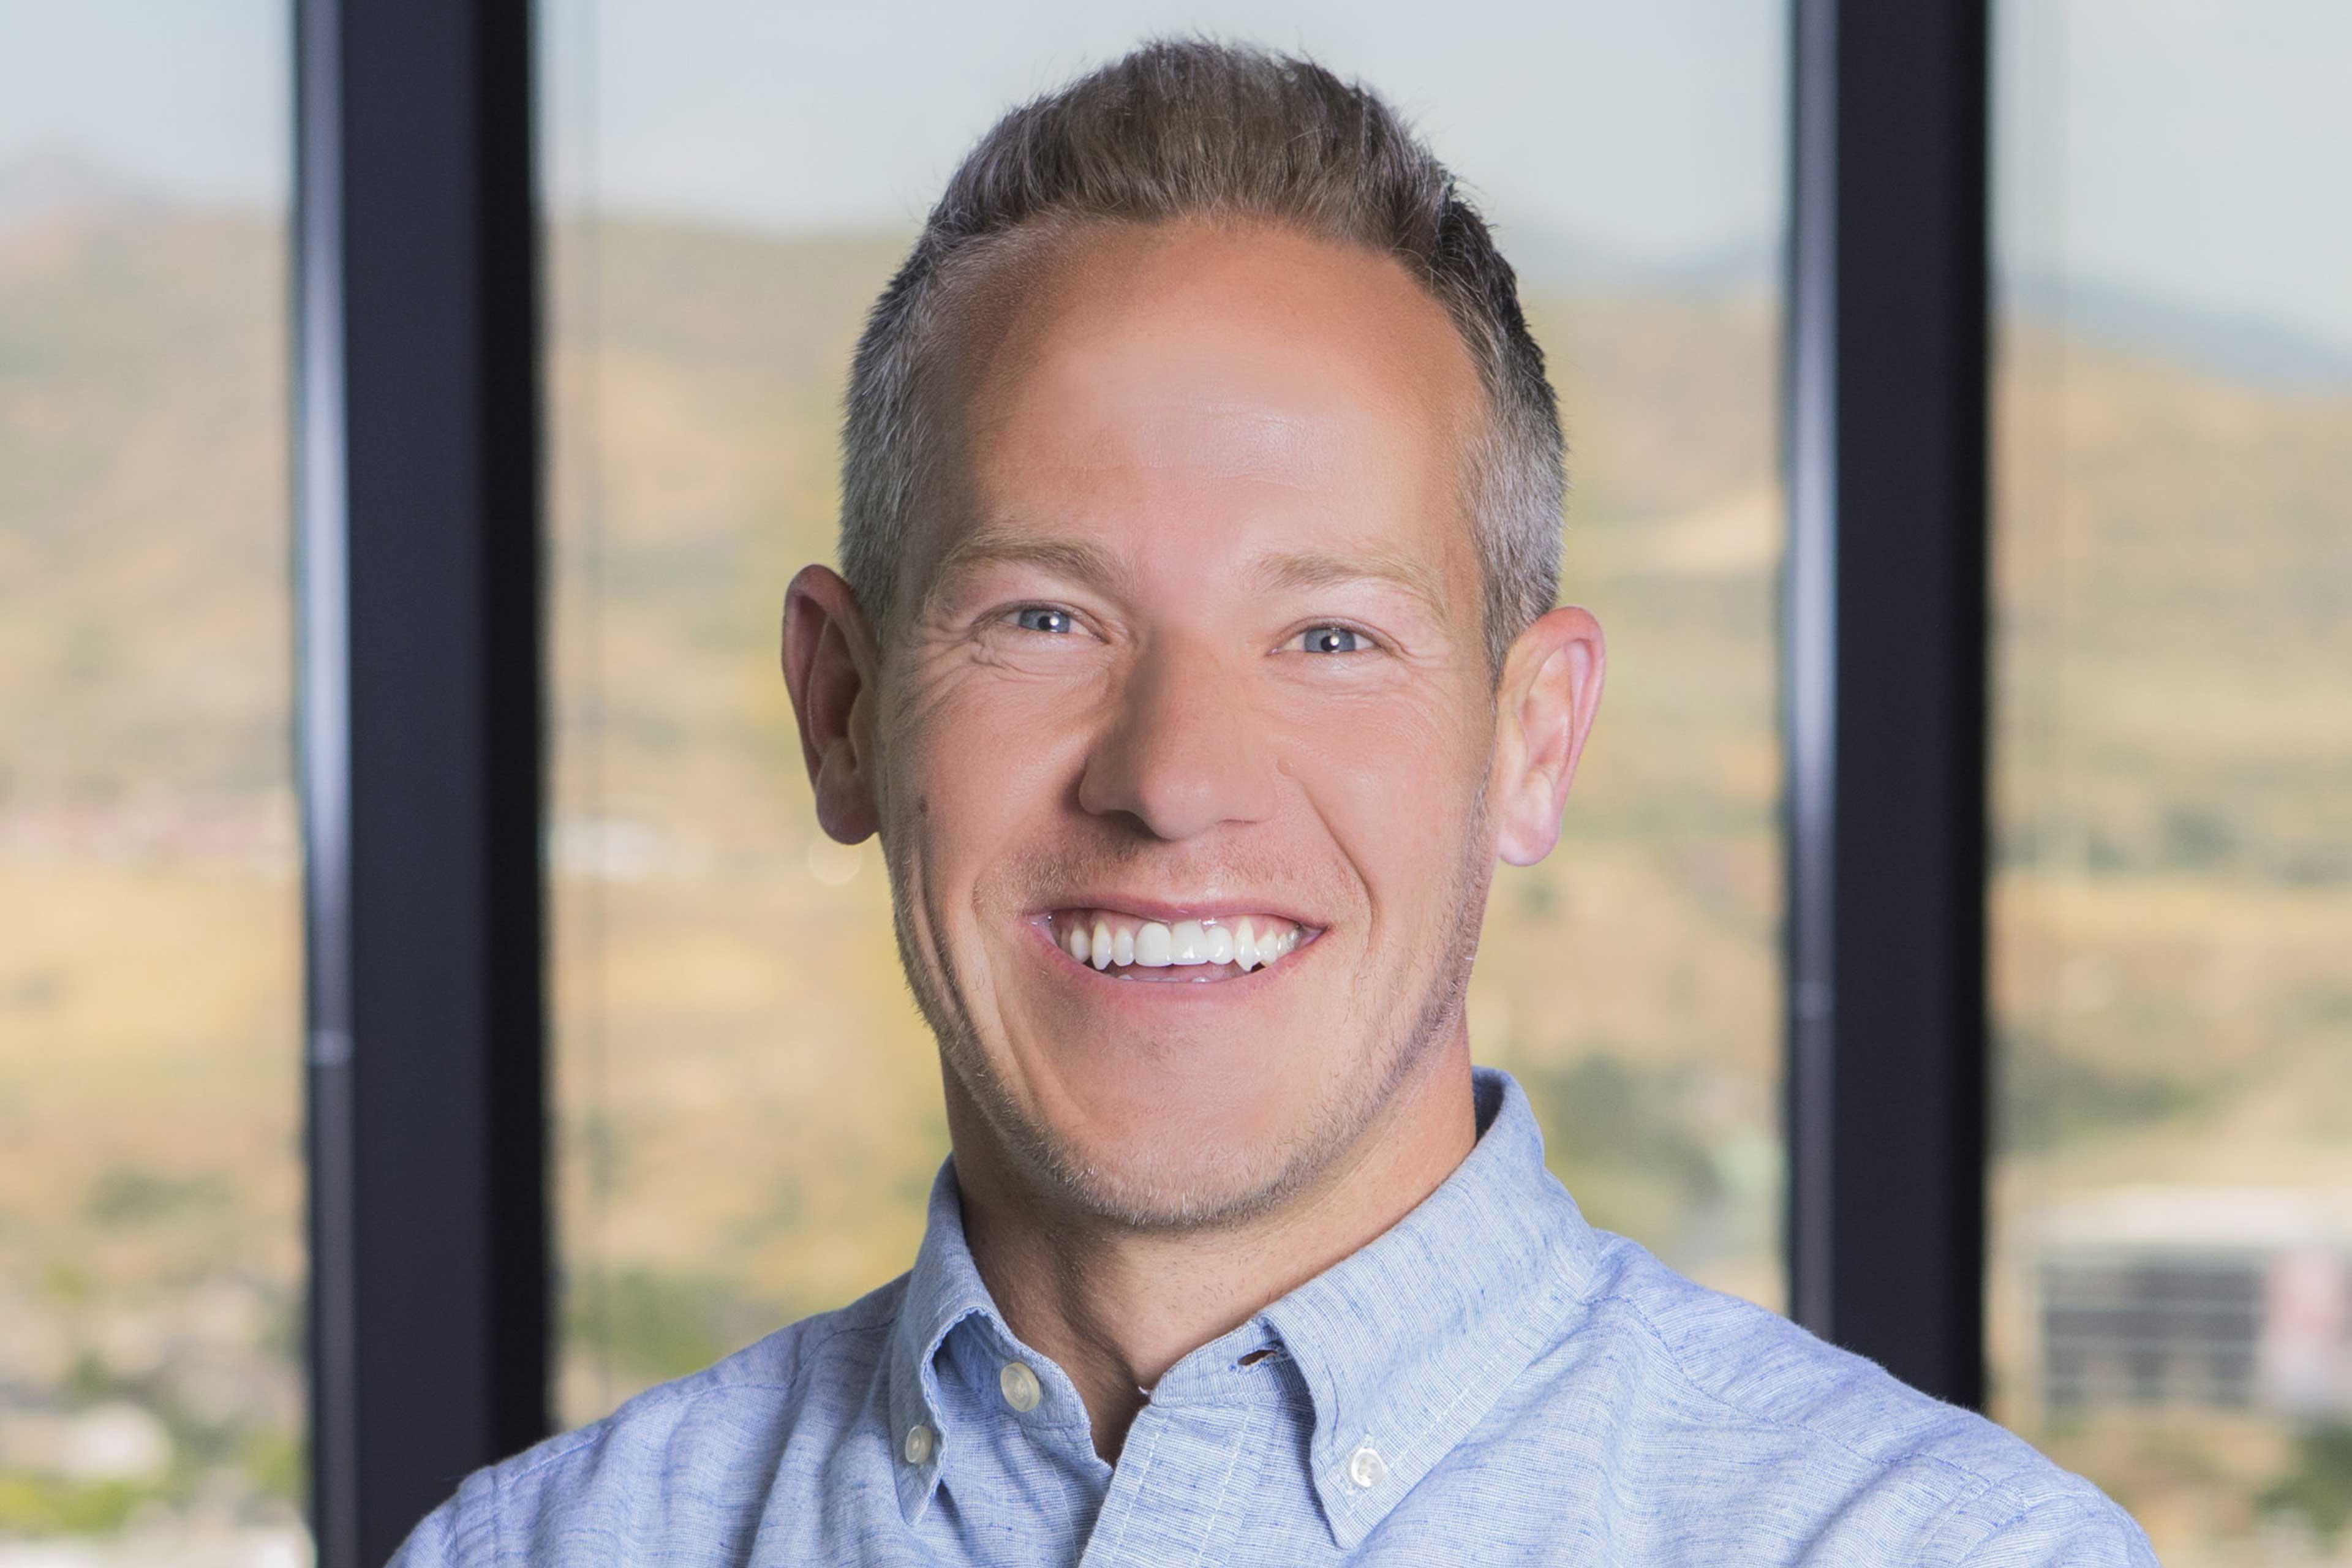 Brock Blake, Co-Founder and CEO, Lendio